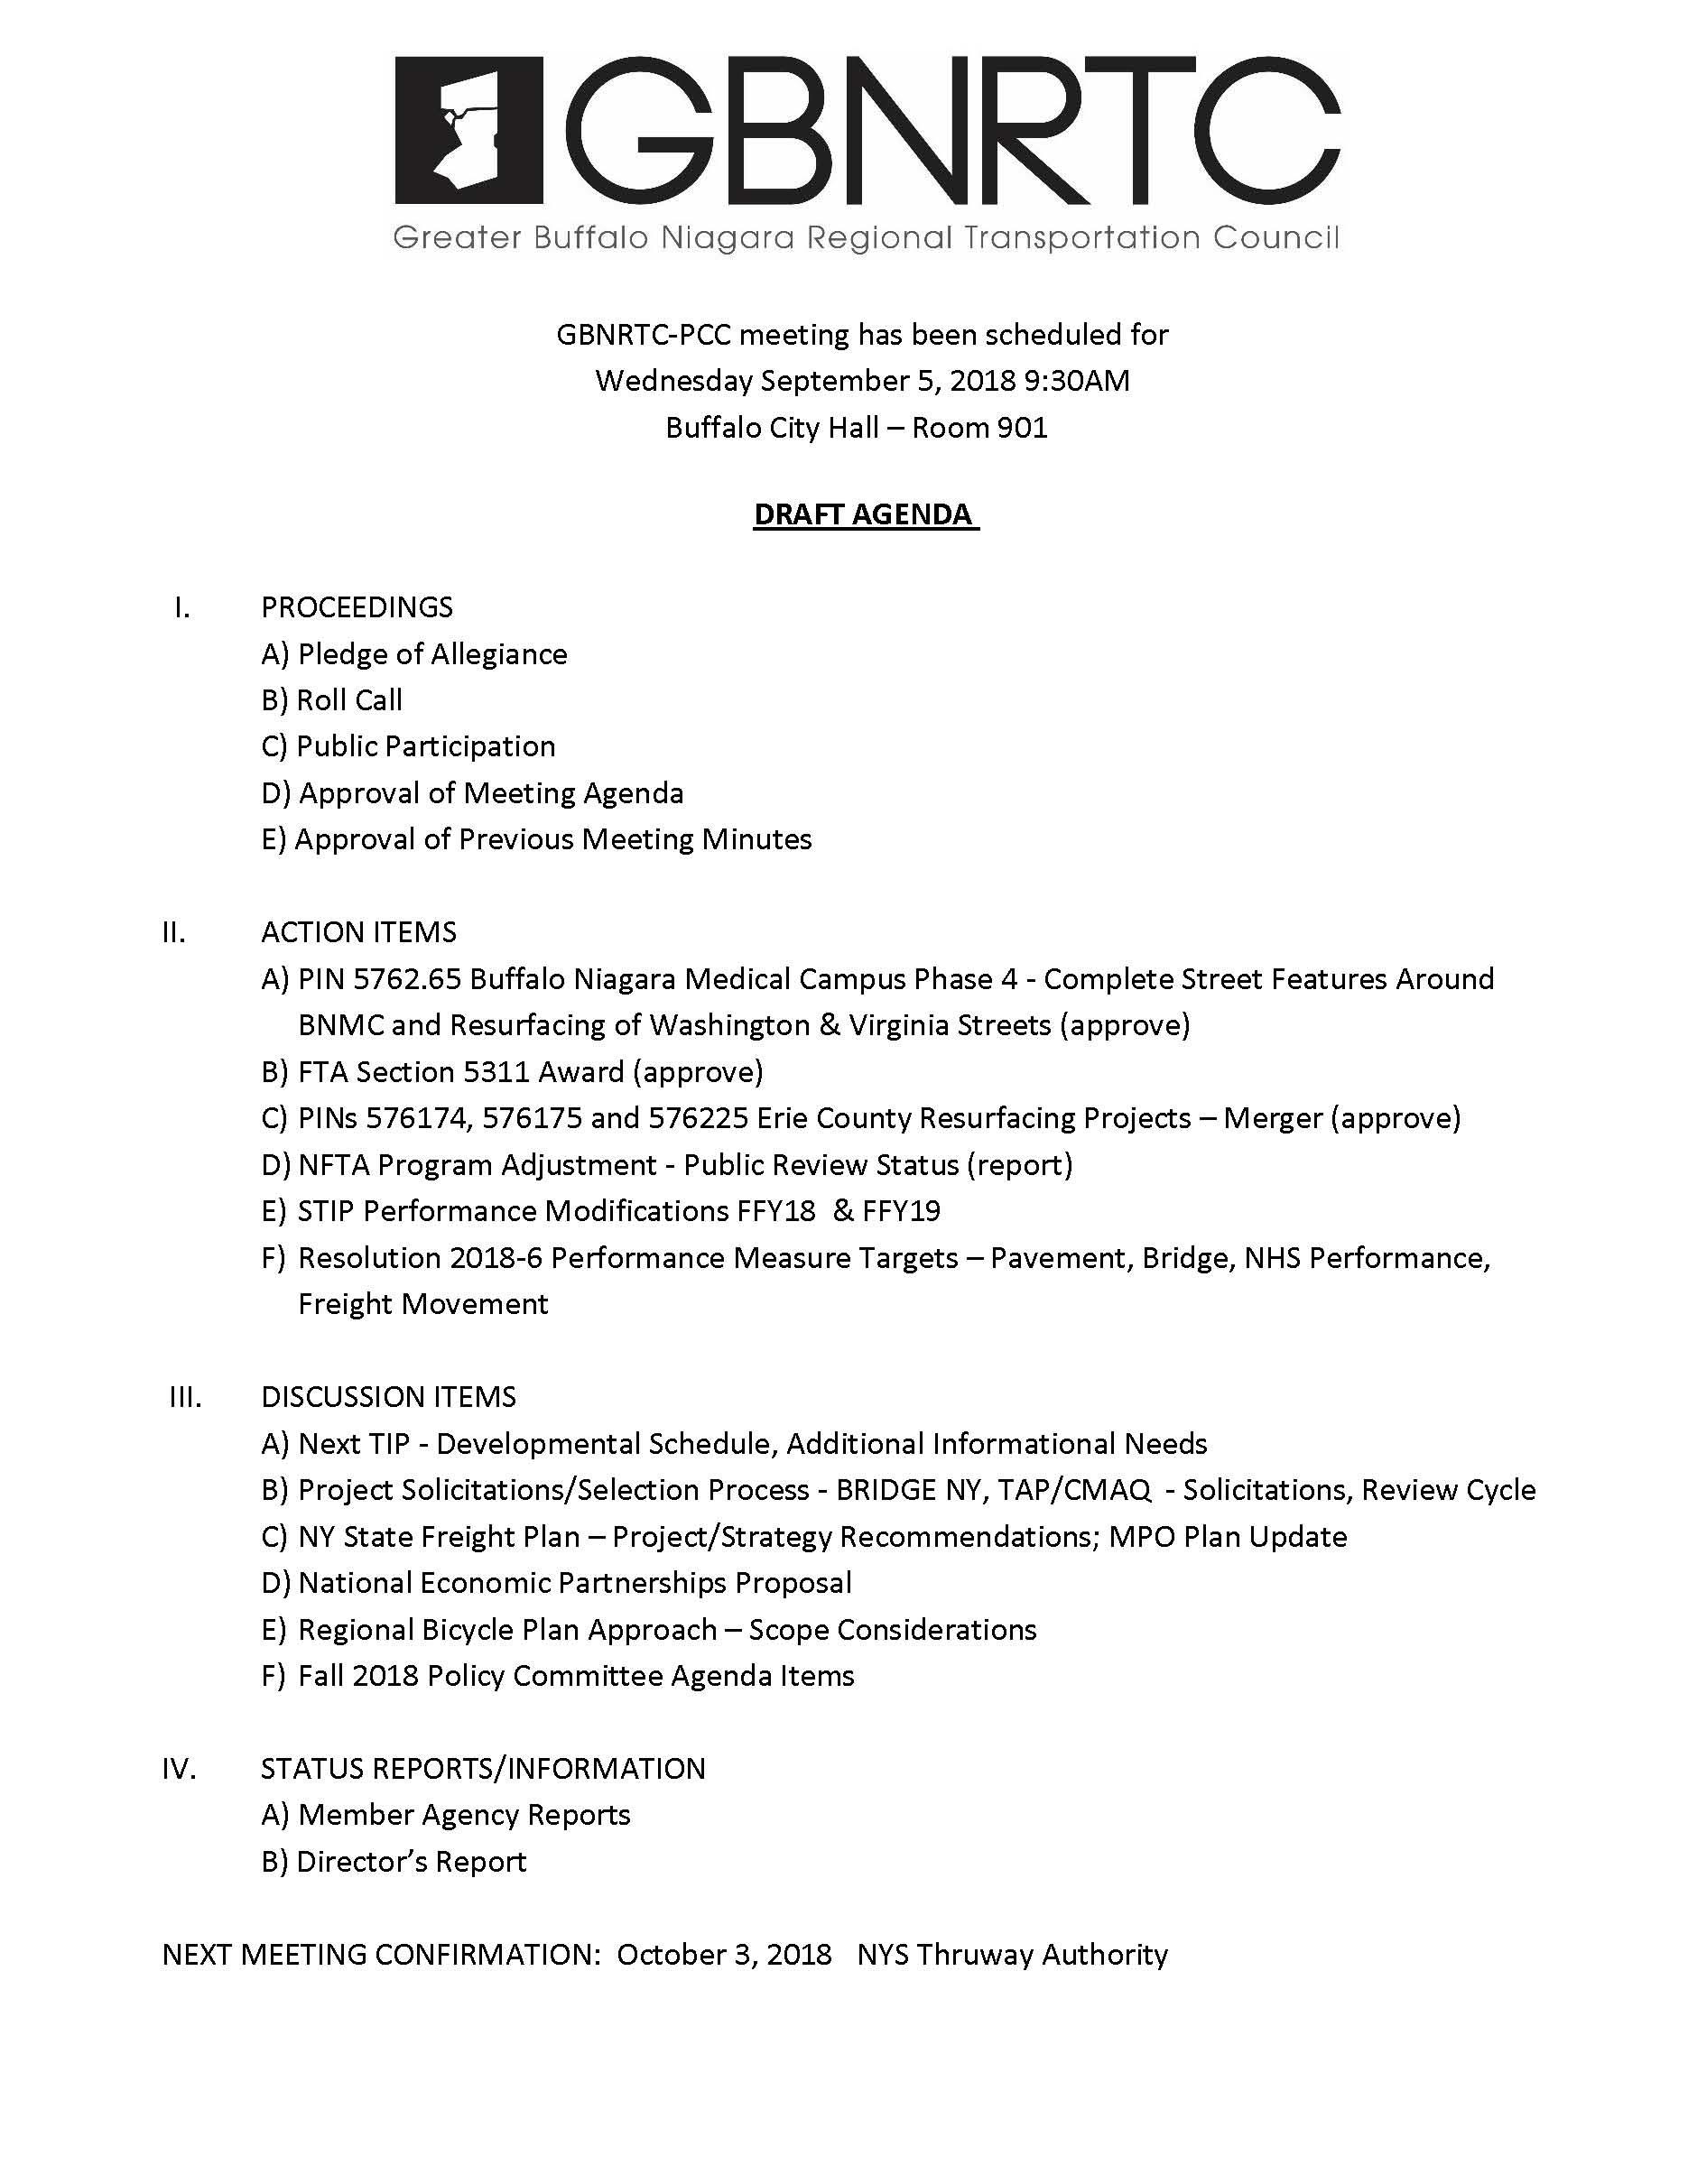 GBNRTC PCC Agenda September 5, 2018